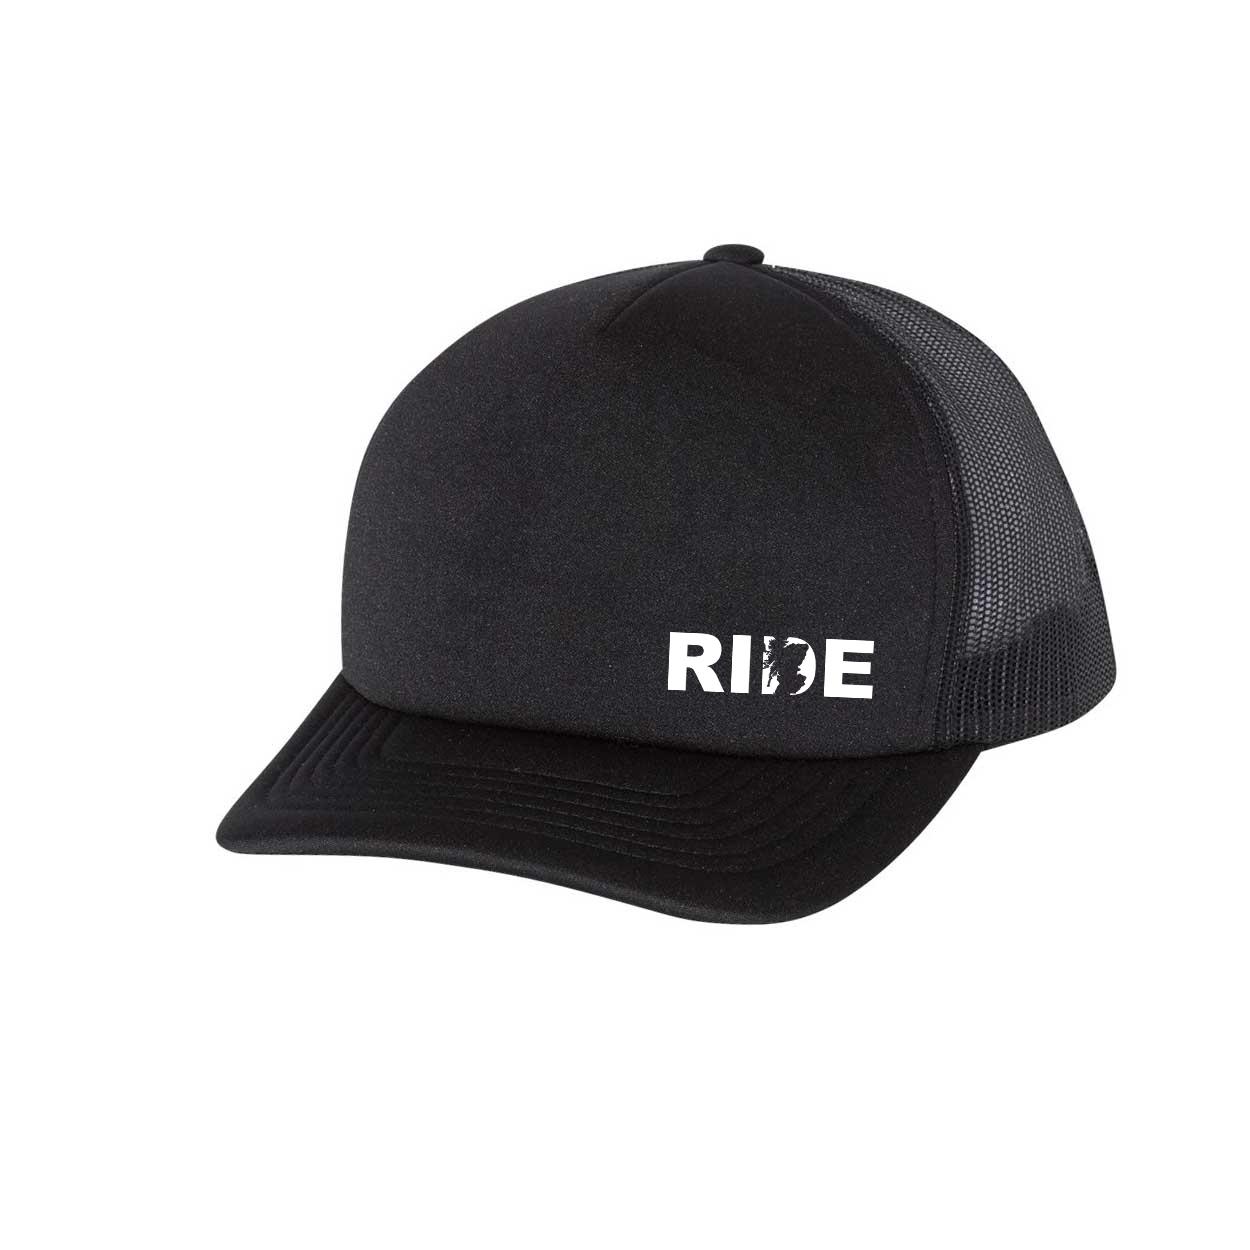 Ride Scotland Night Out Premium Foam Trucker Snapback Hat Black (White Logo)